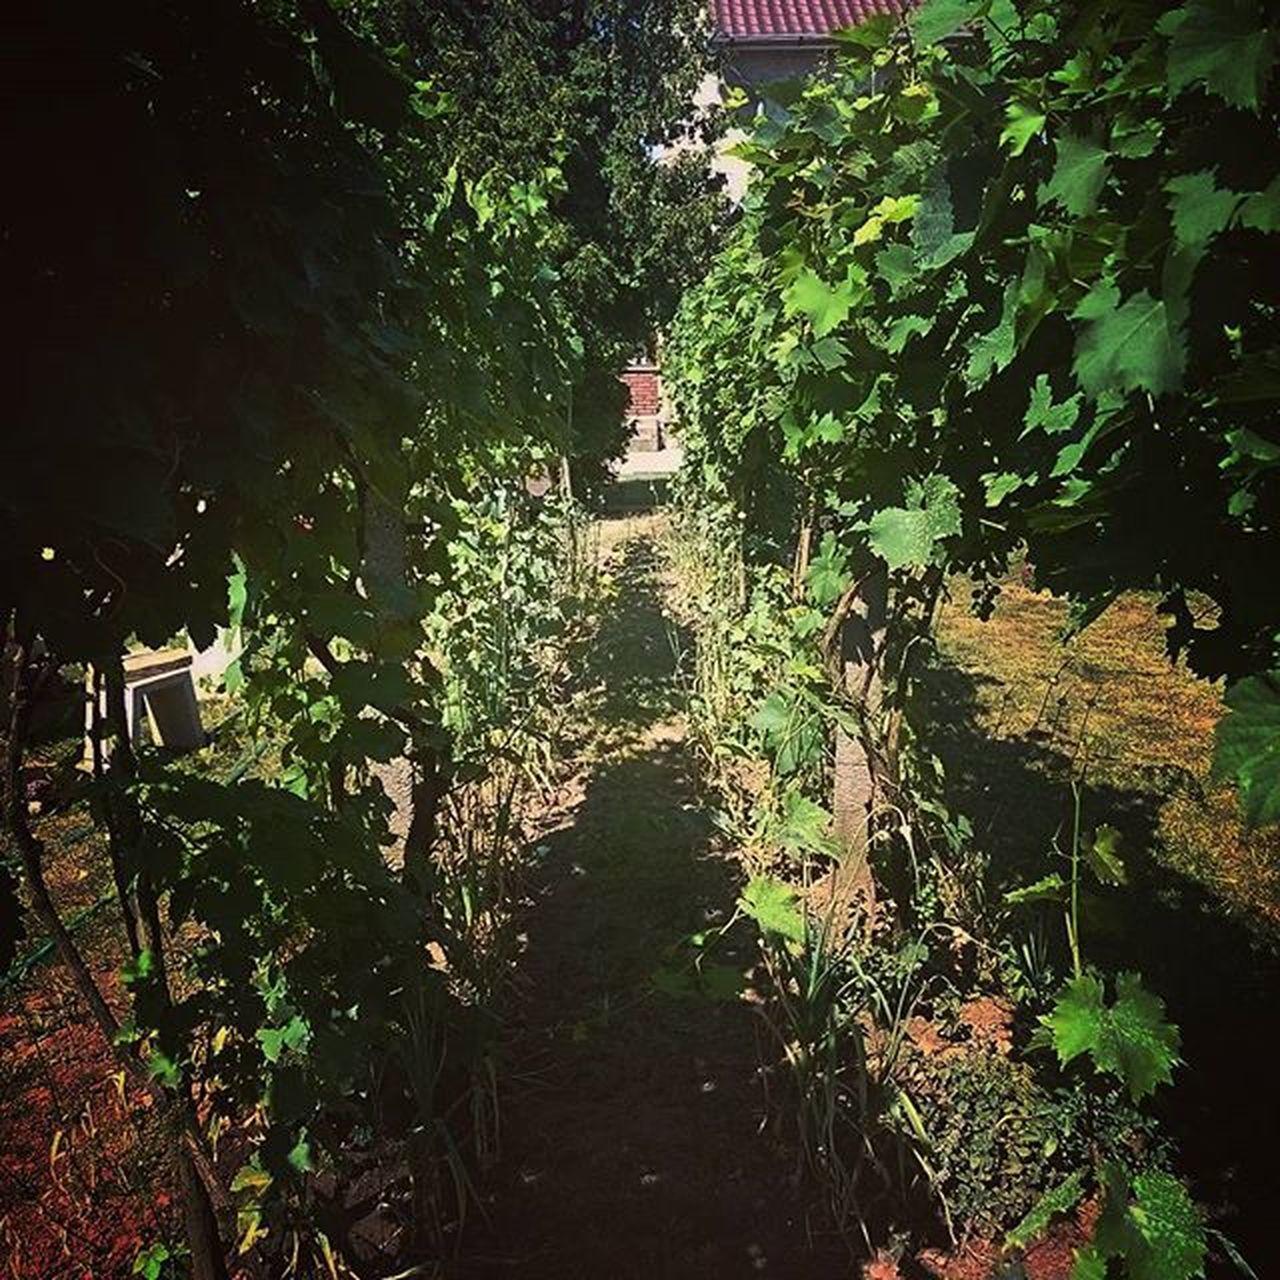 Our little Wineyard Backyard Grapes Green Summertime Hungary Homesweethome Nature Garden Mediterran Feeling Mik Ikozosseg Ig_hun Instahun Instagardenlovers Country